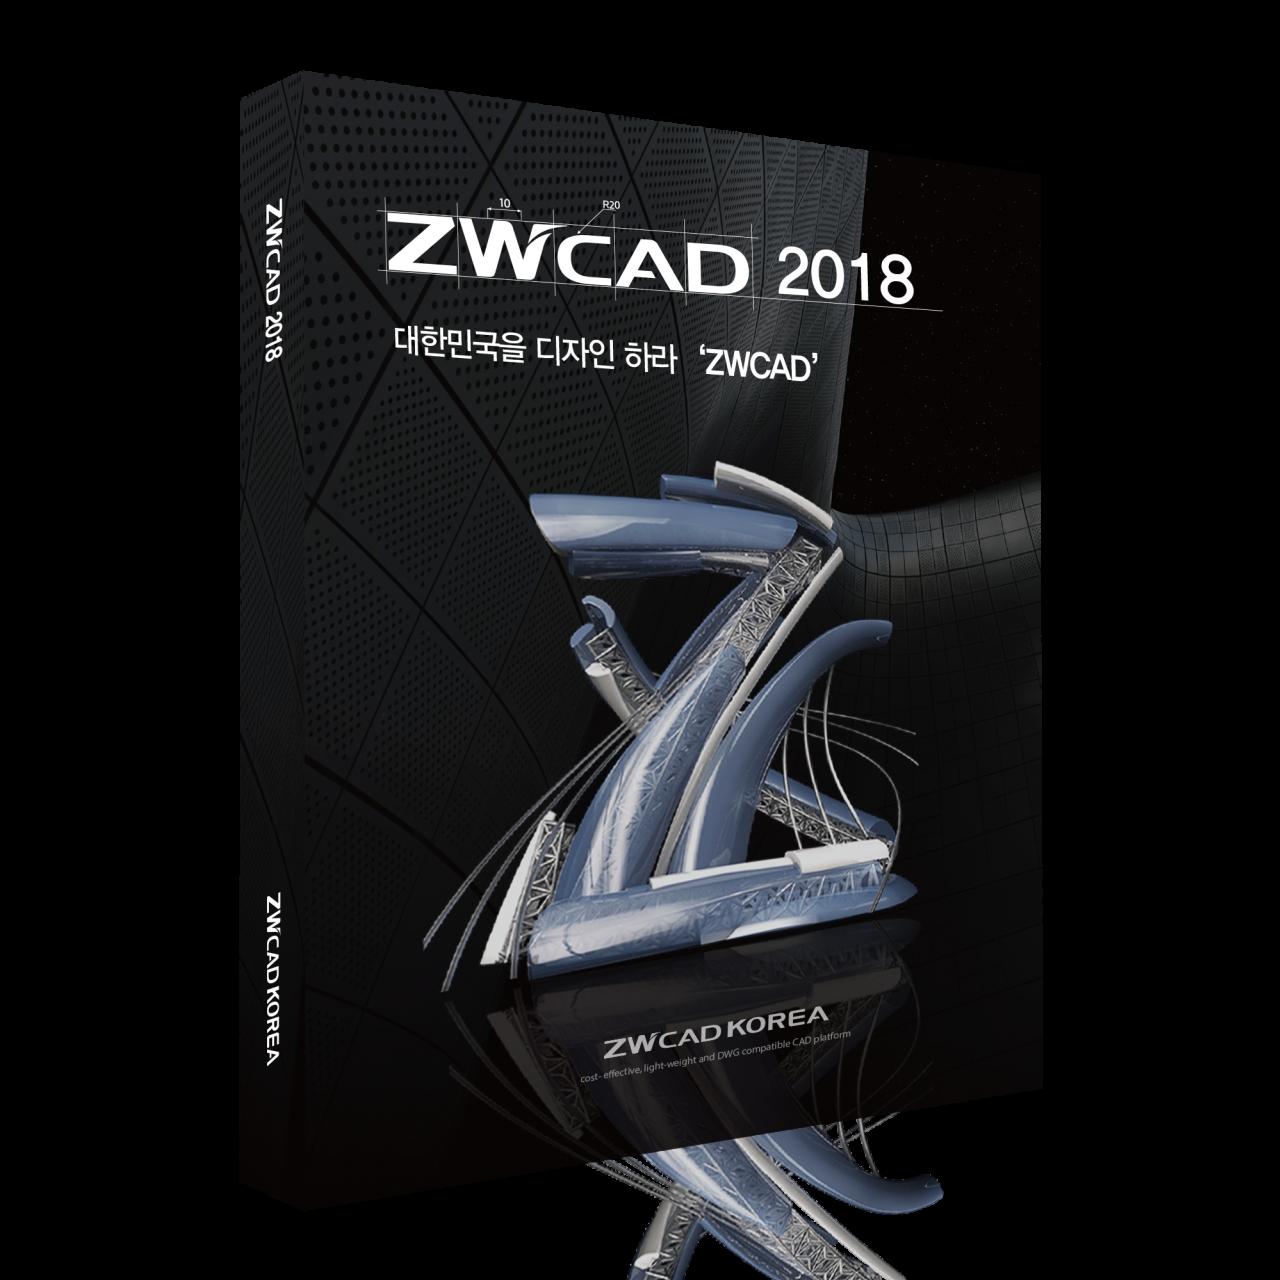 ZWCAD(지더블유캐드)